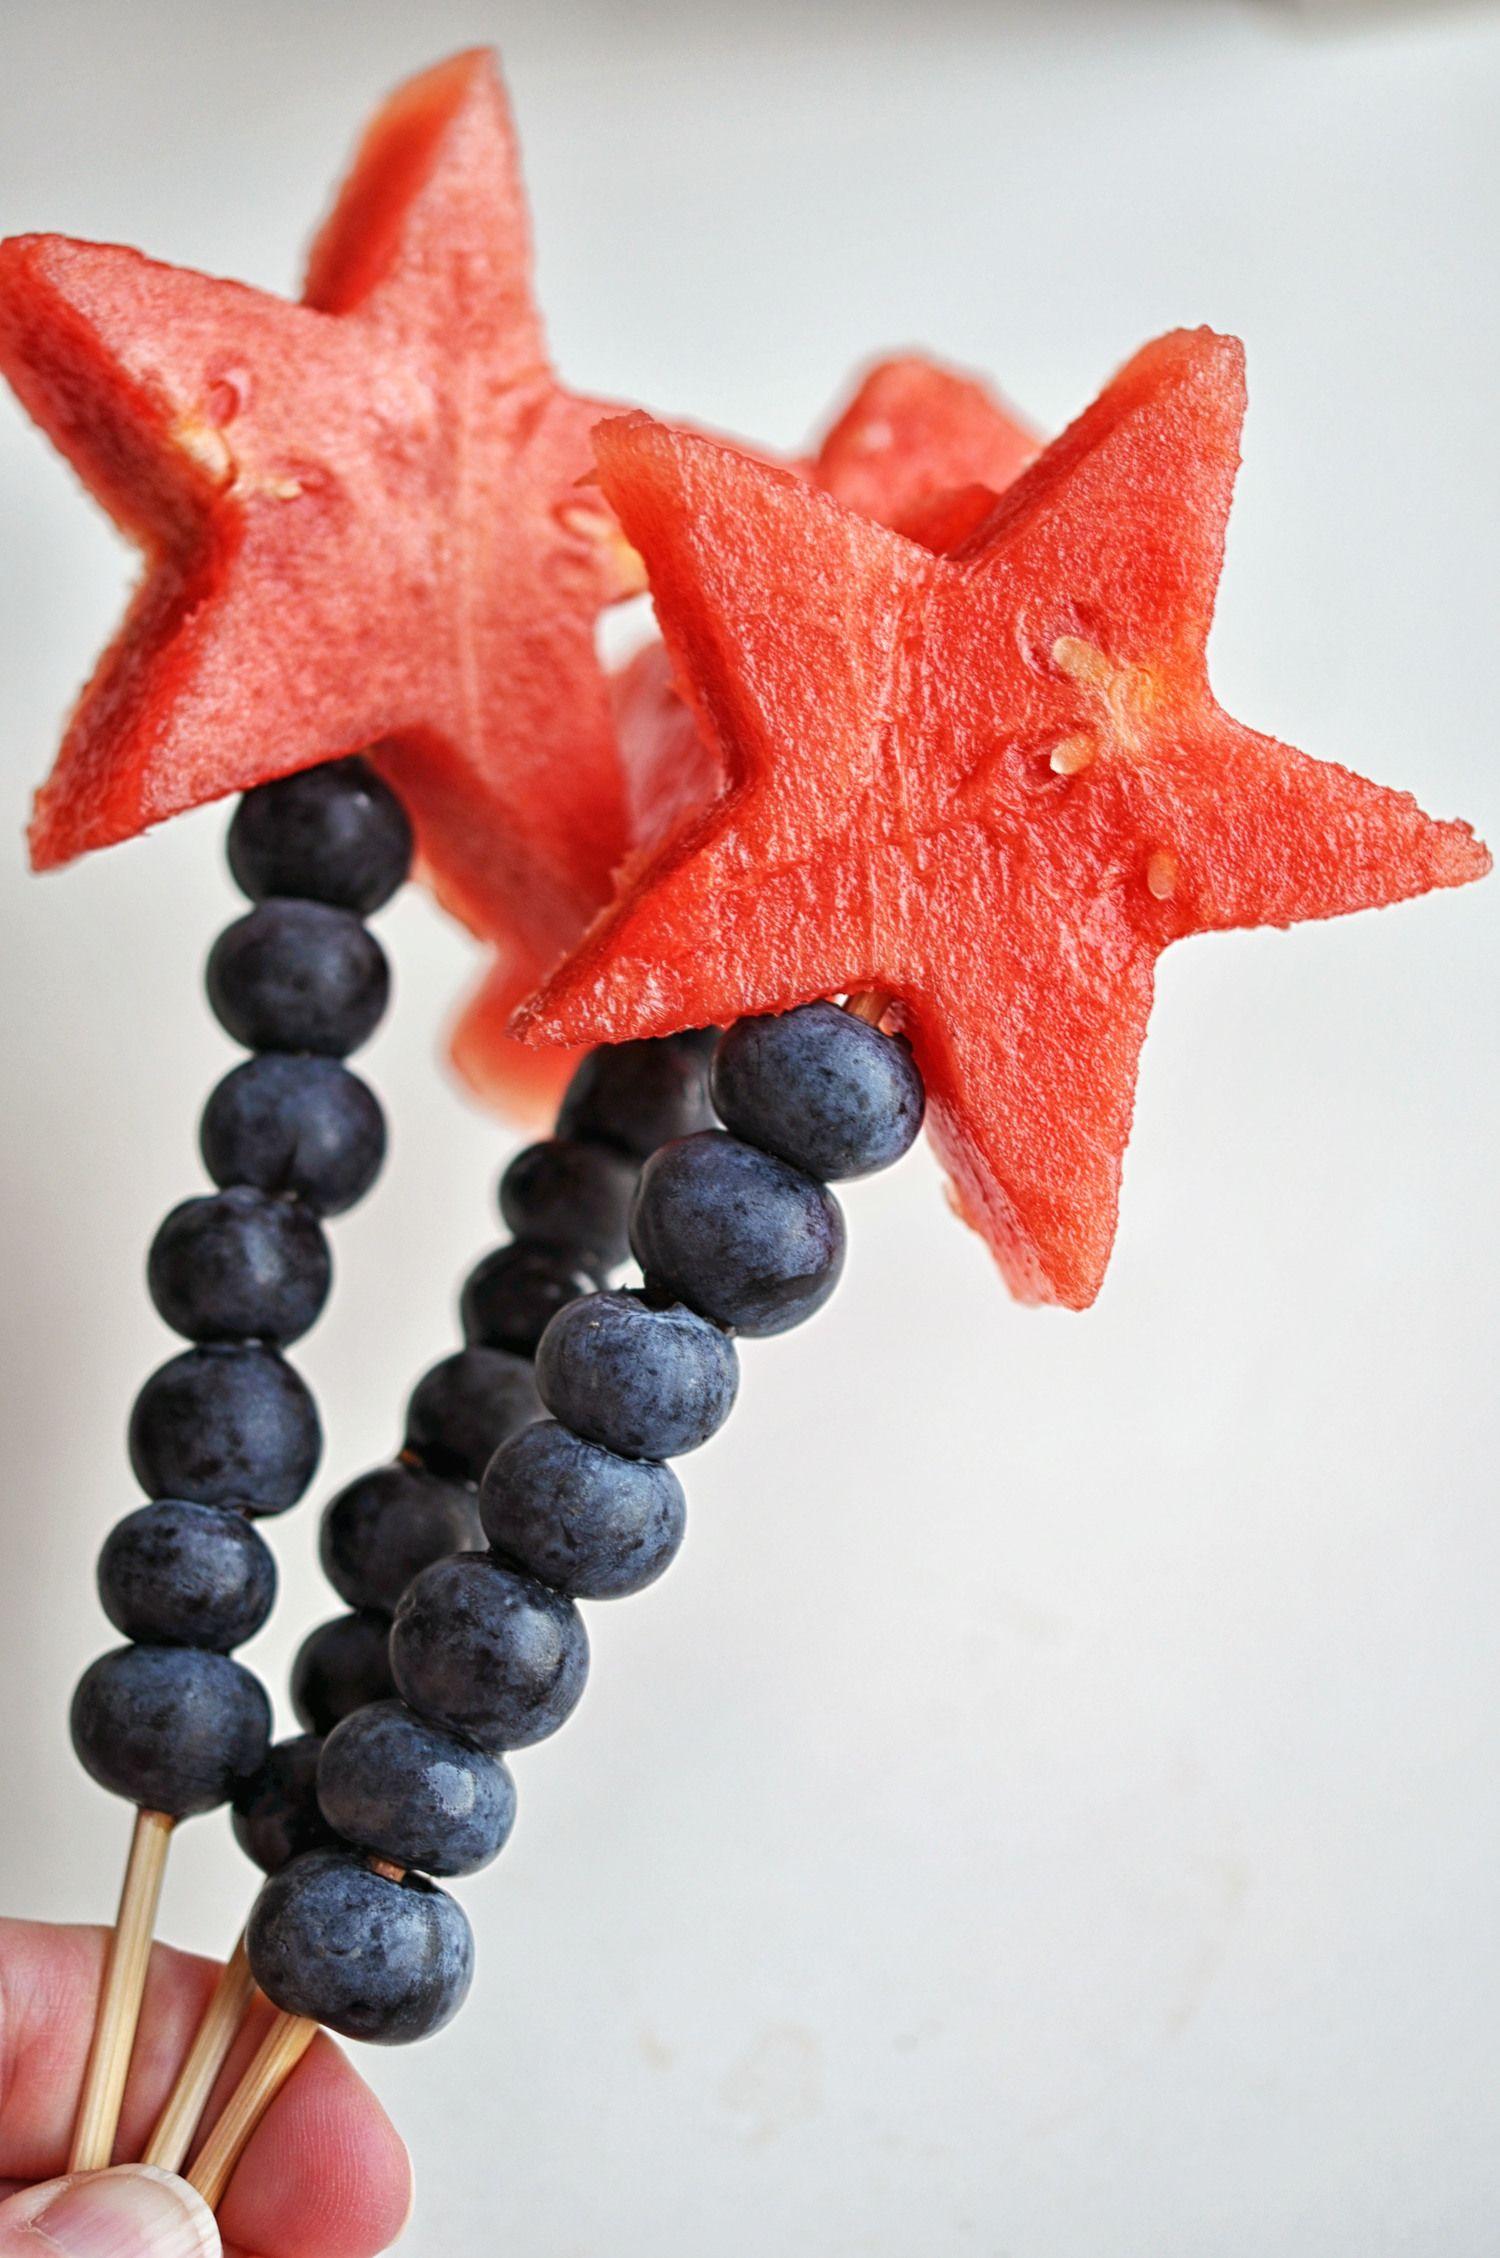 Watermelon Blueberry Sparklers